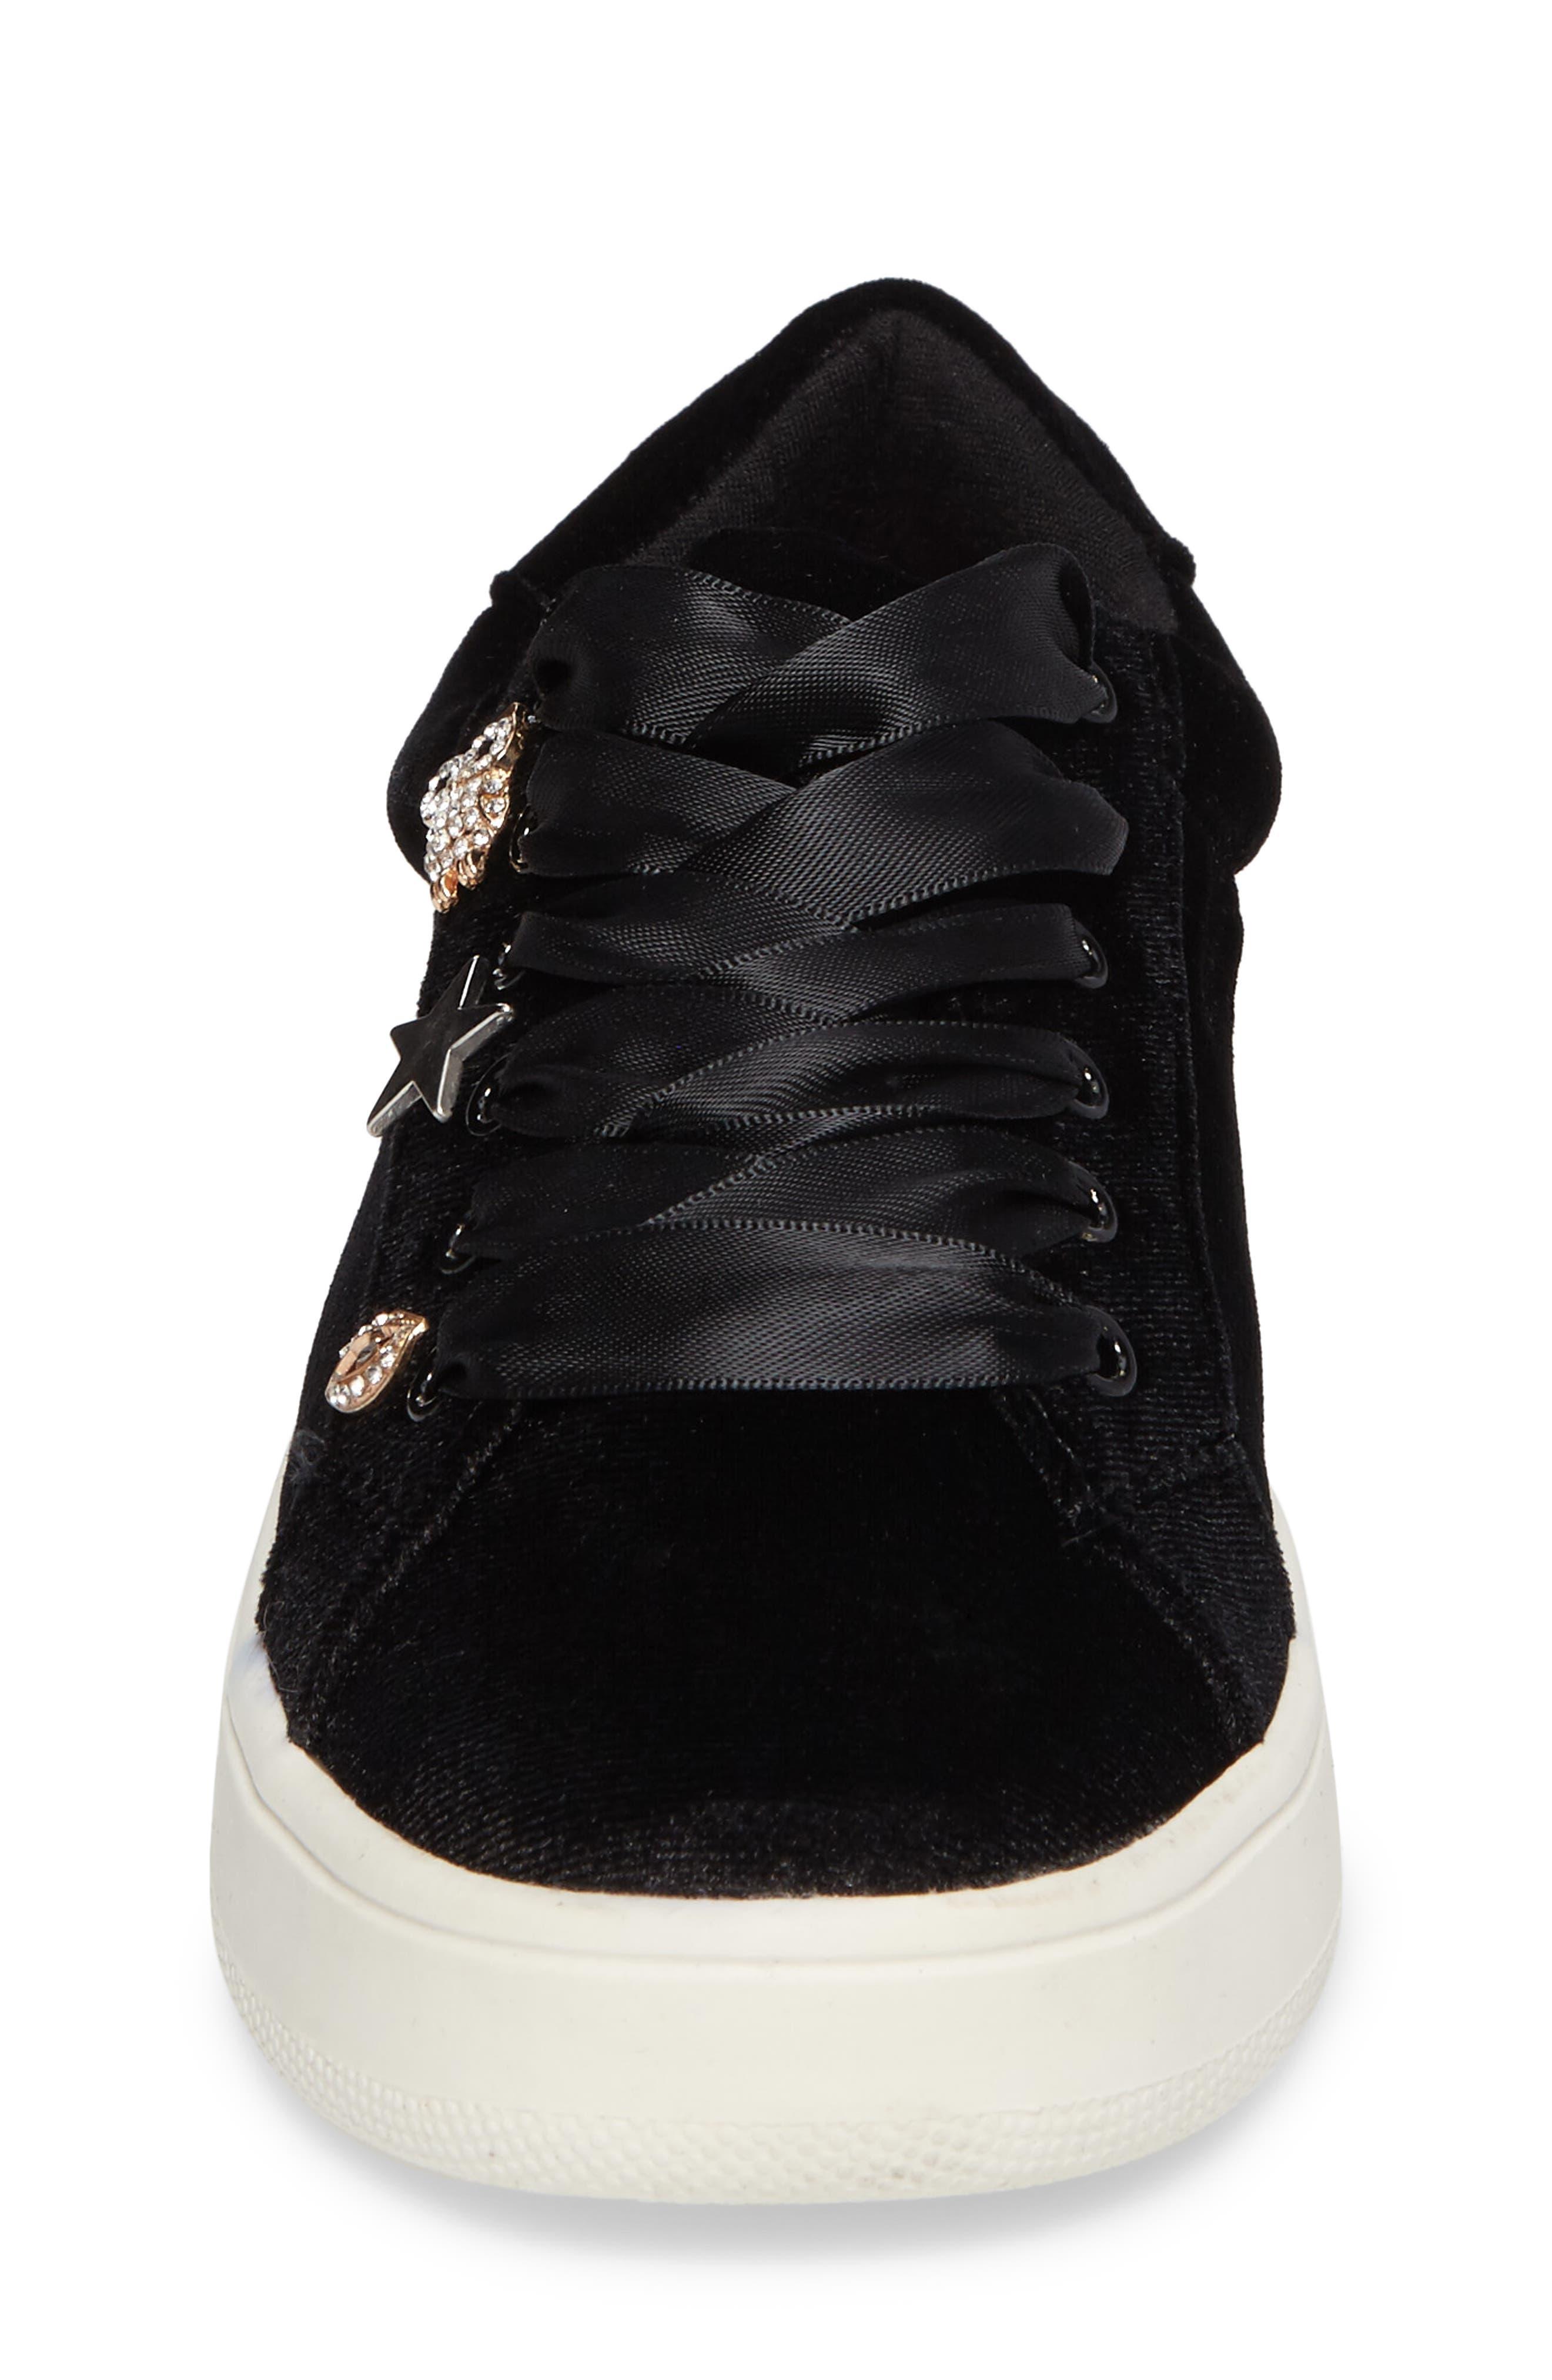 Jbertiec Charm Sneaker,                             Alternate thumbnail 4, color,                             009